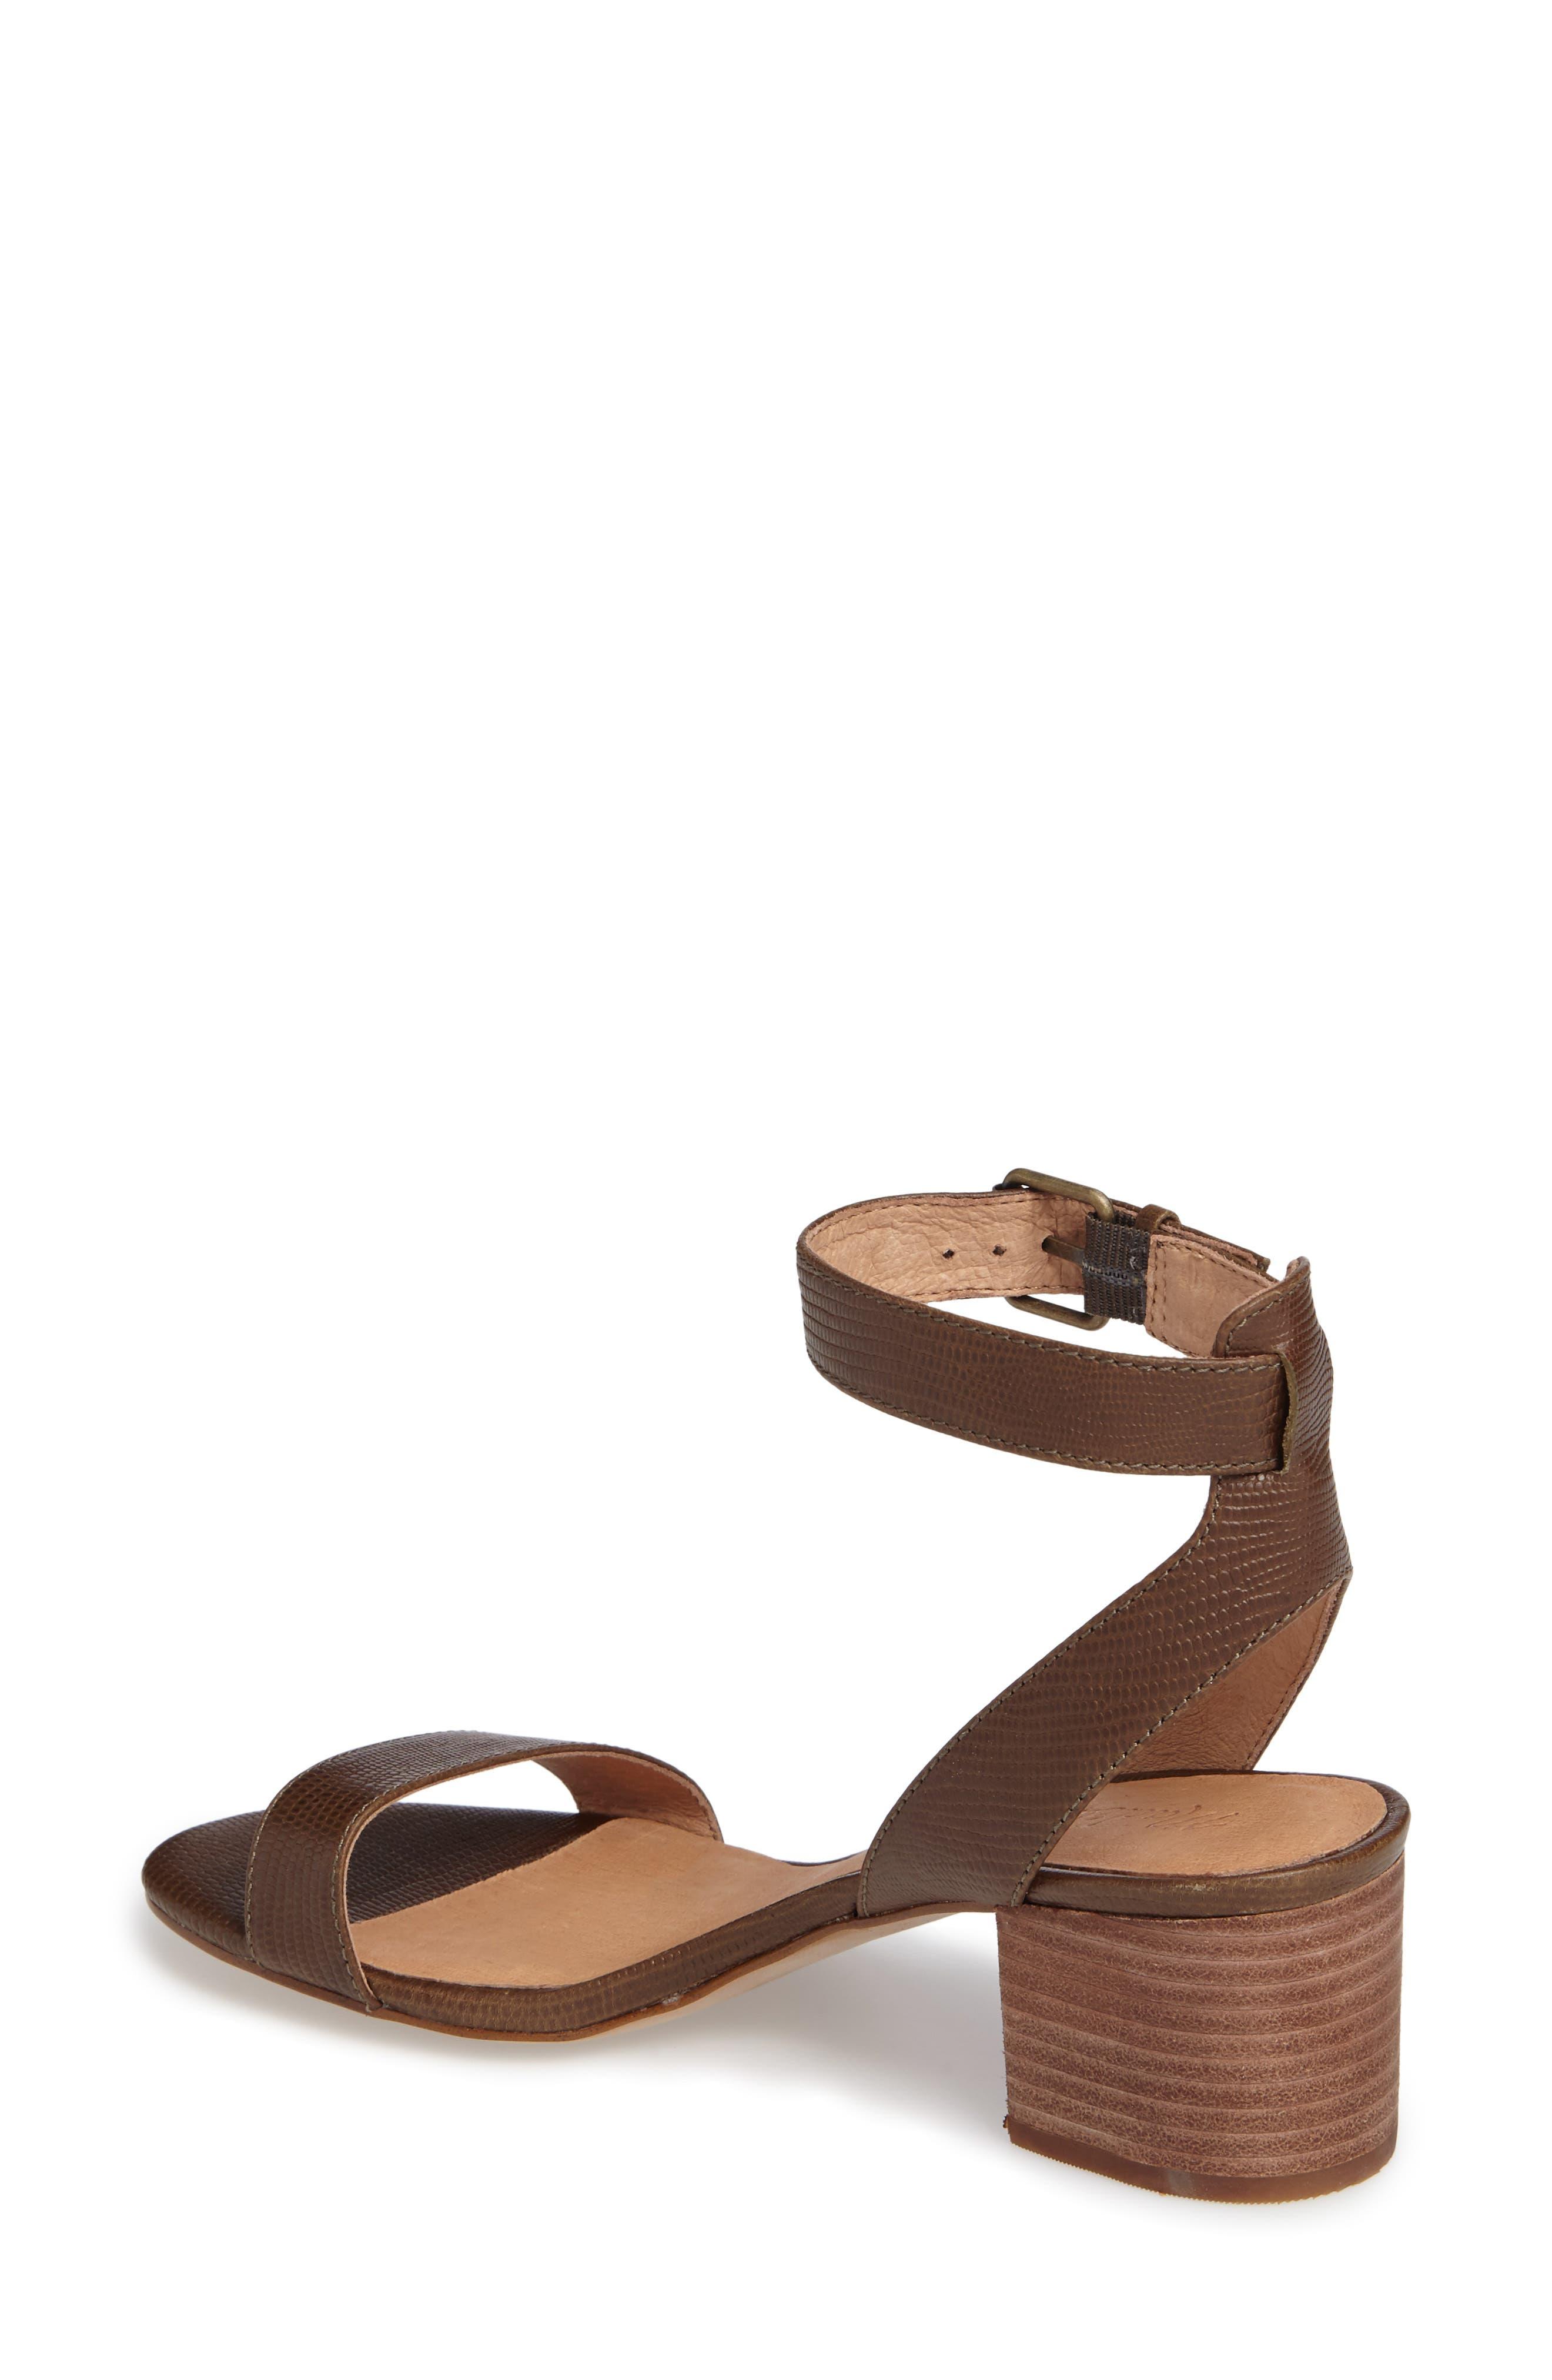 Alice Embossed Ankle Wrap Sandal,                             Alternate thumbnail 2, color,                             250